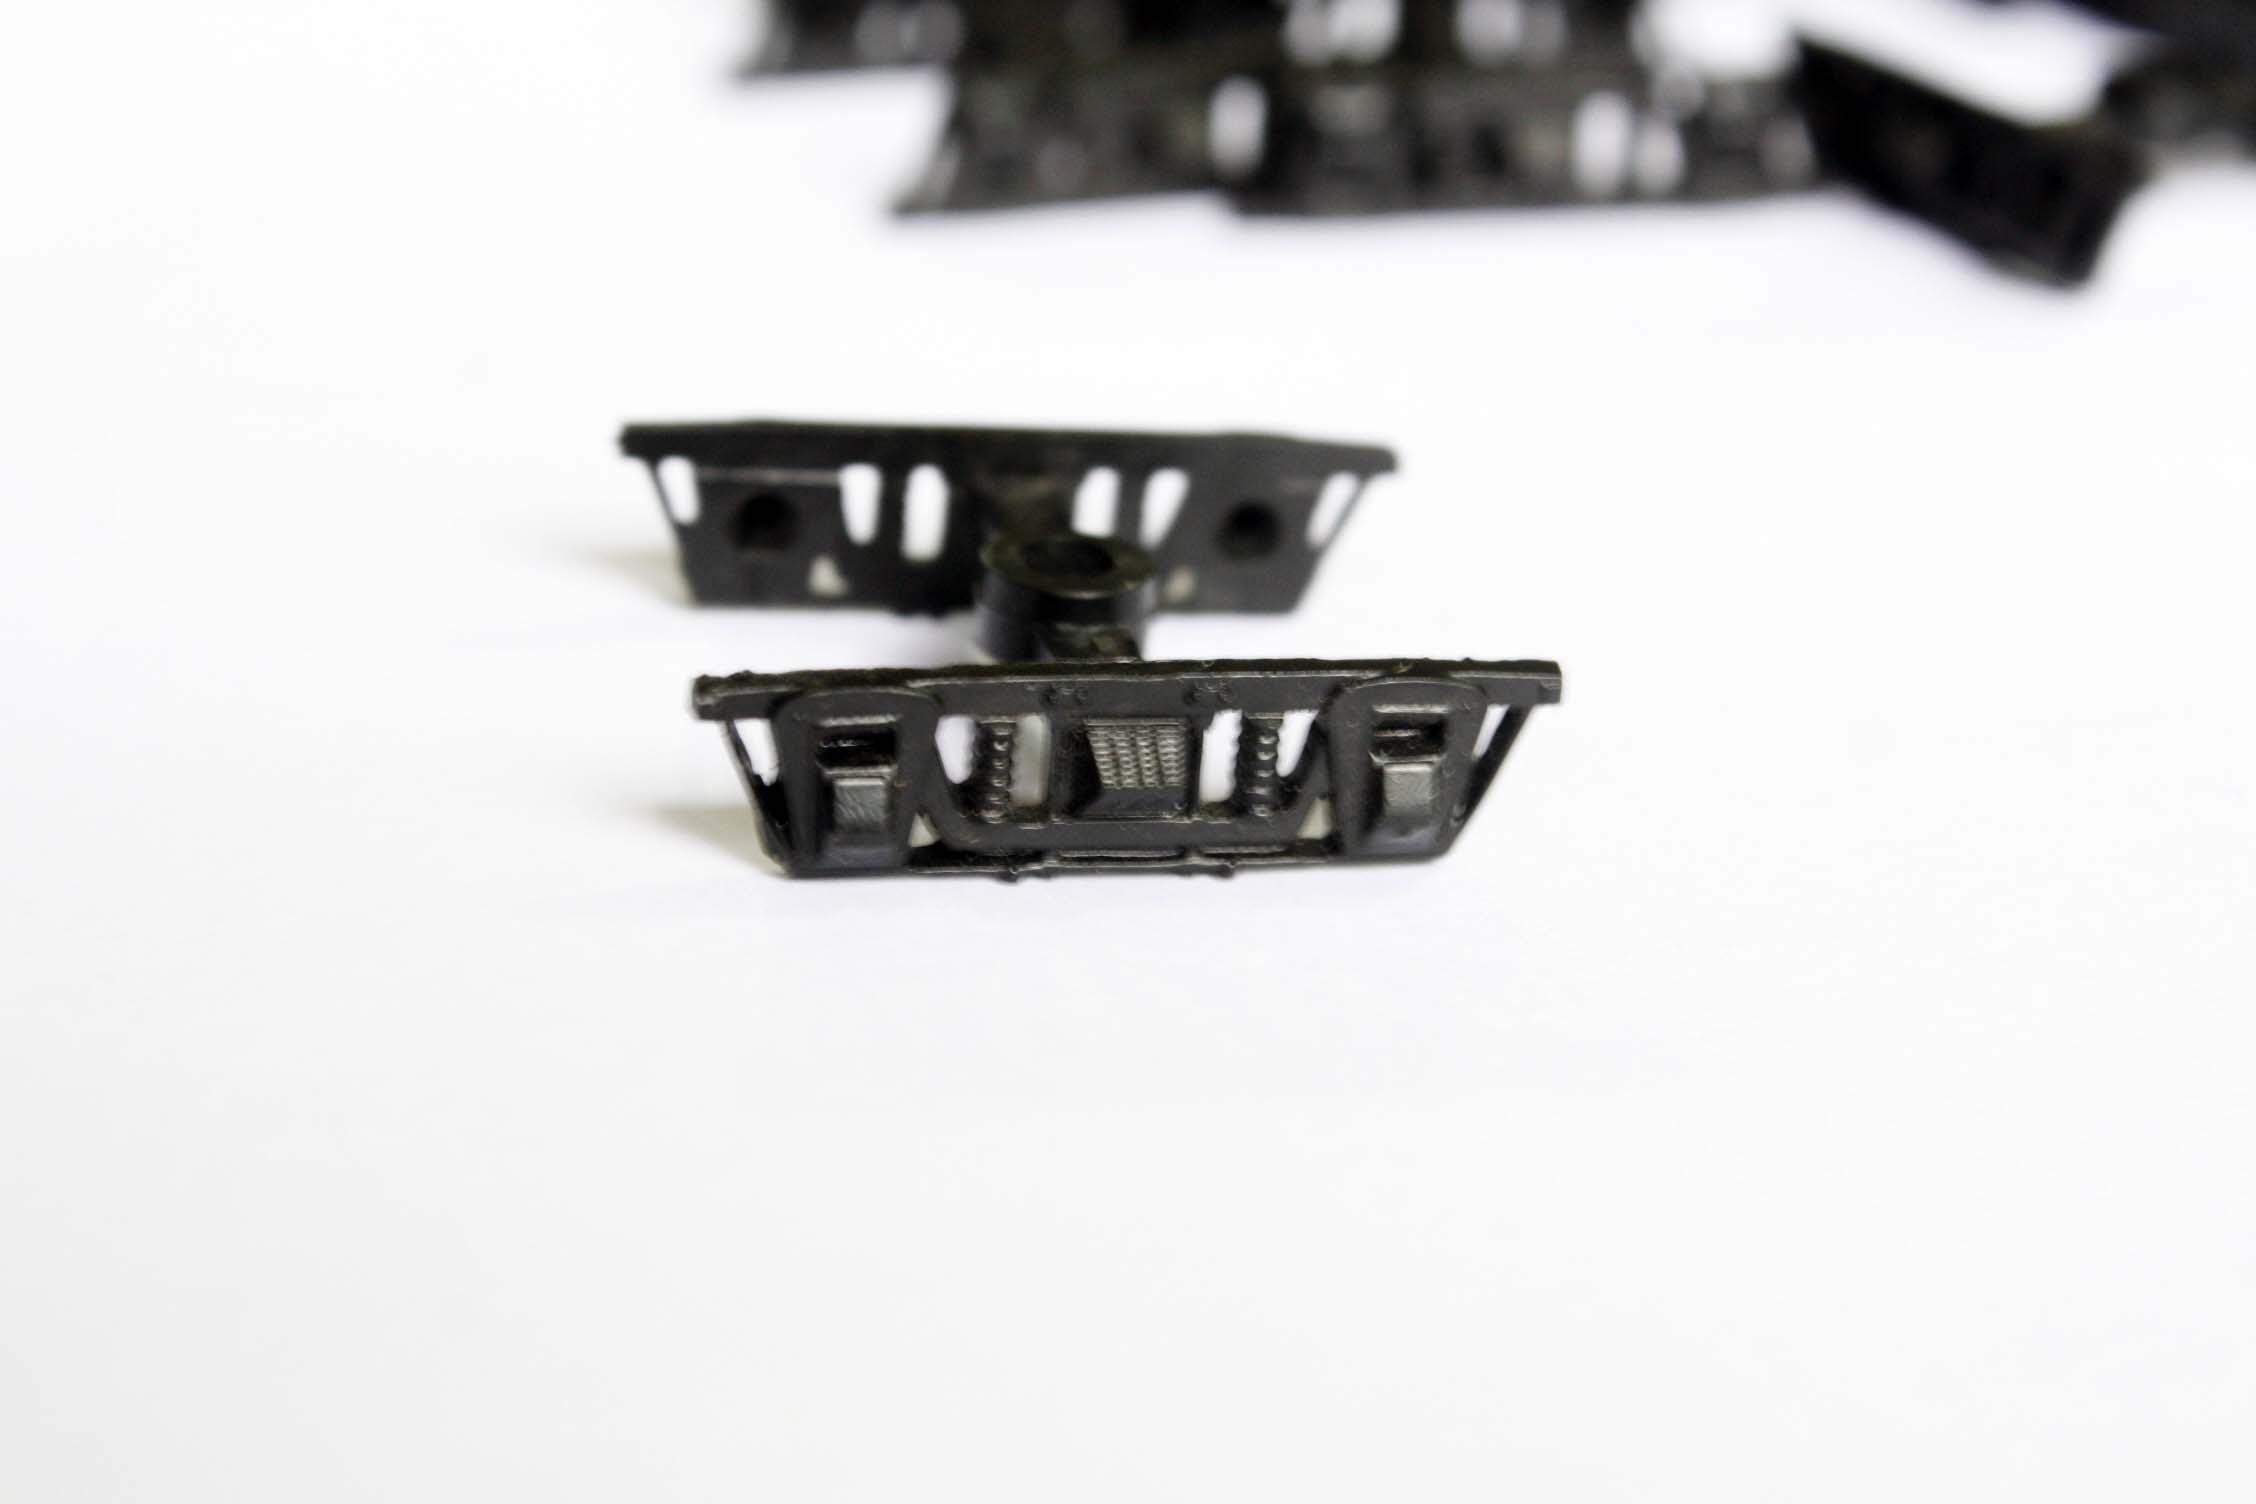 87 scale HO ratio train model toy bogie train miniature accessories building materials